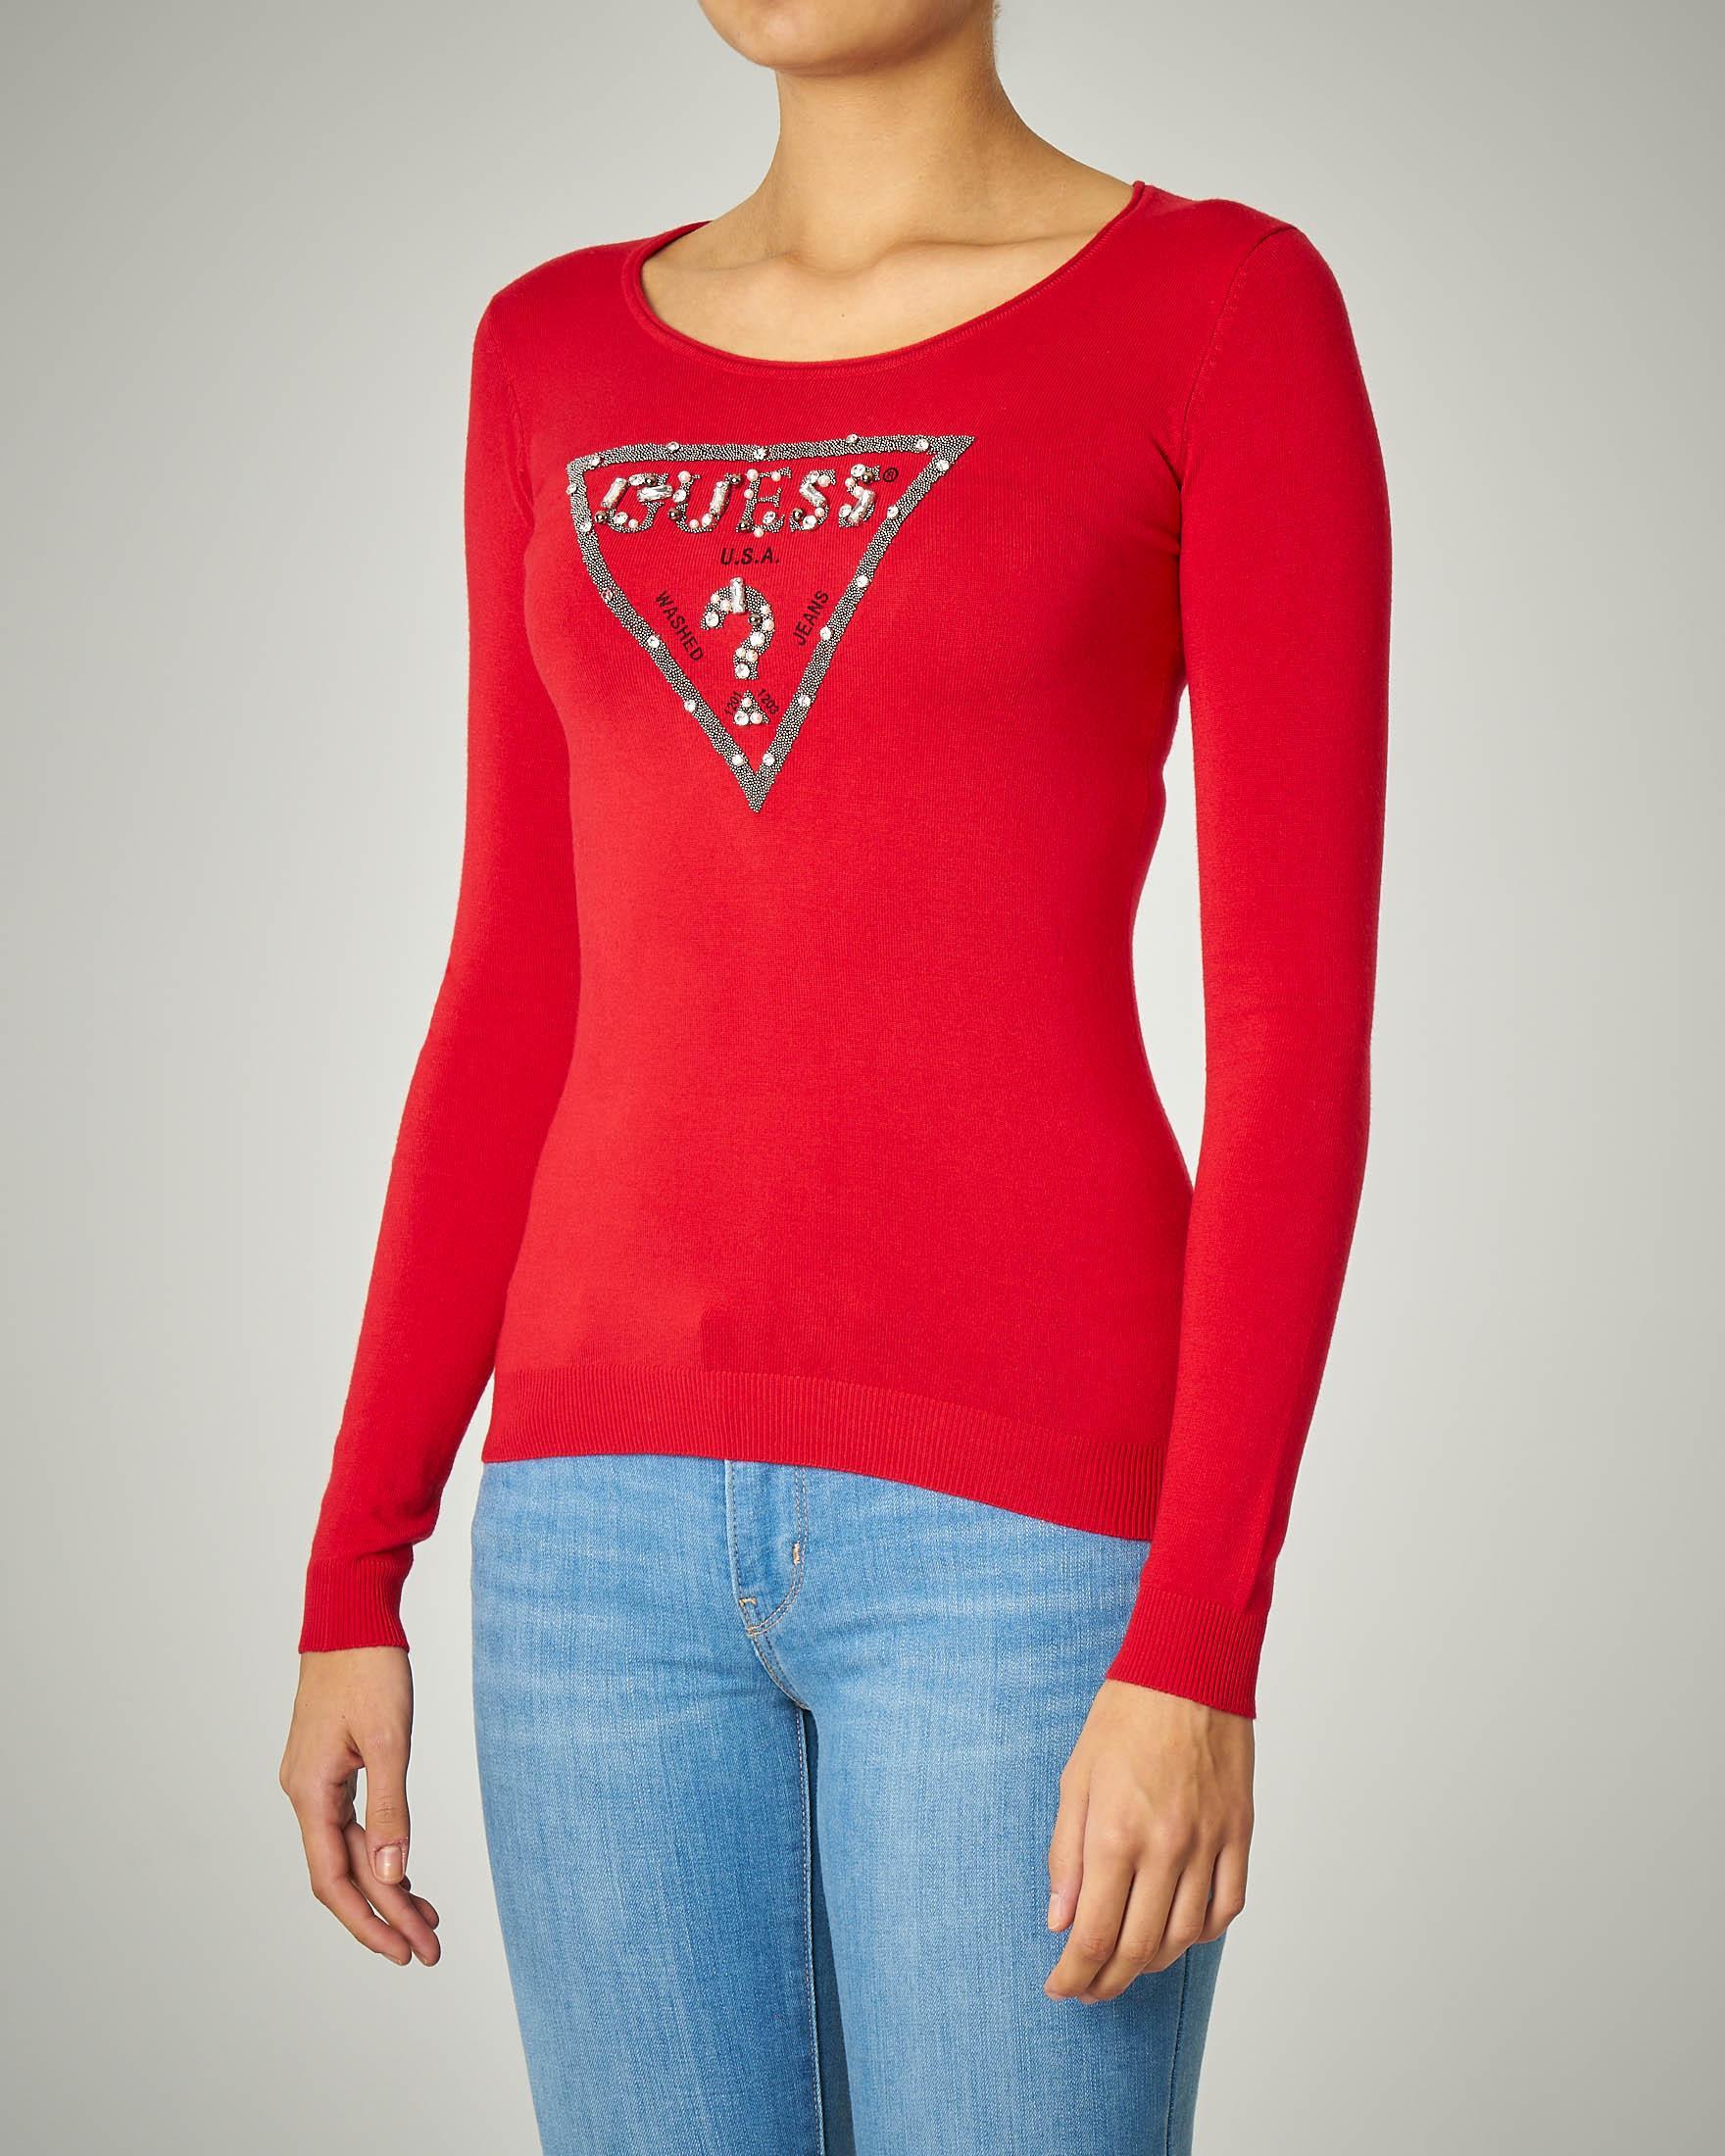 T-shirt rossa manica lunga con logo